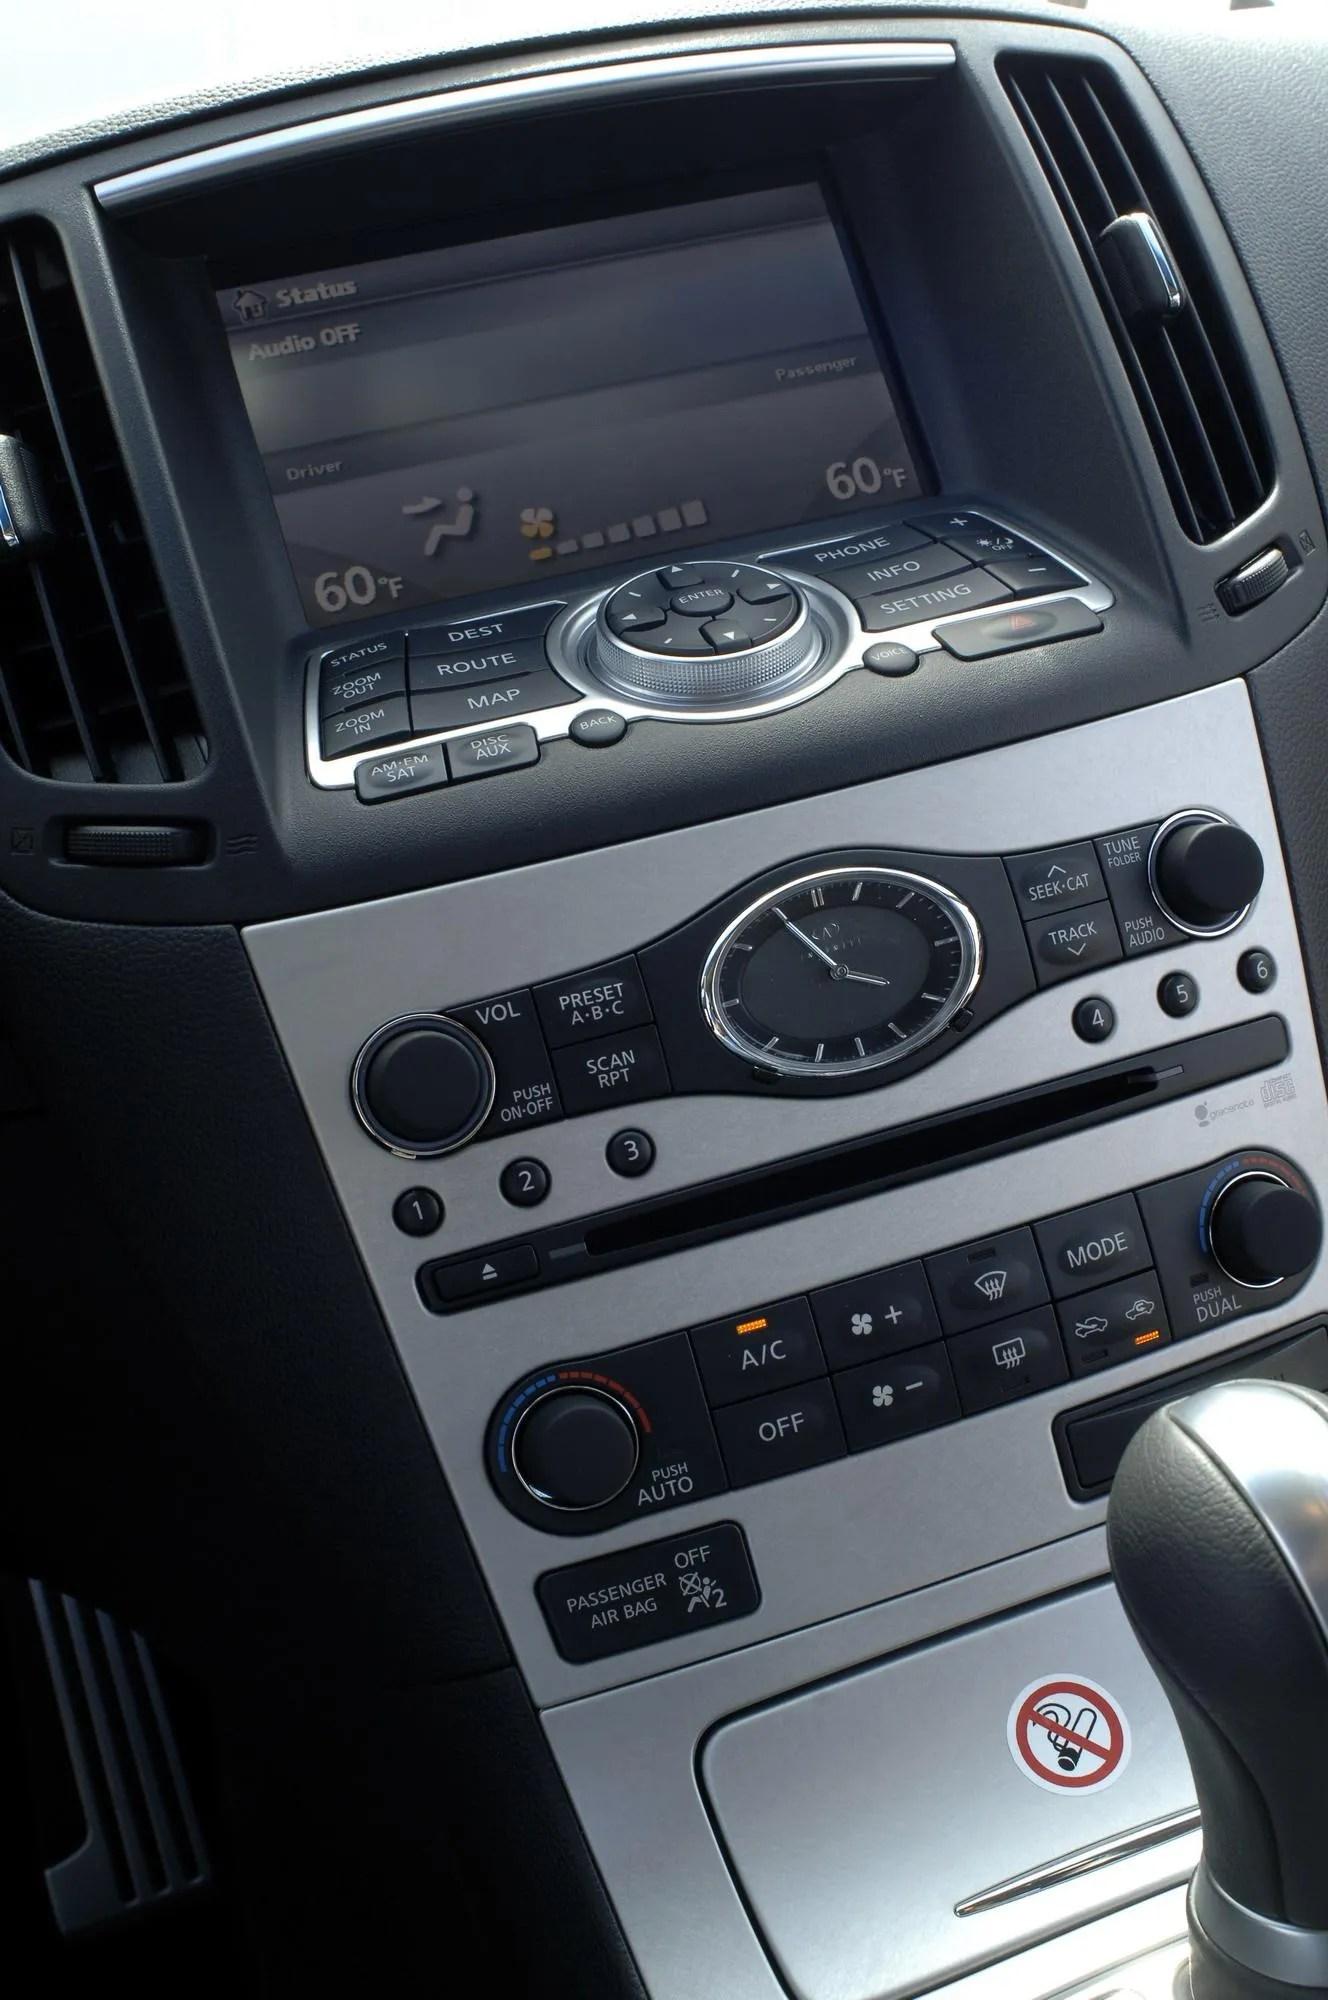 hight resolution of 2008 infiniti g37 top speed infiniti g37 coupe interior infiniti g37 audio system diagram